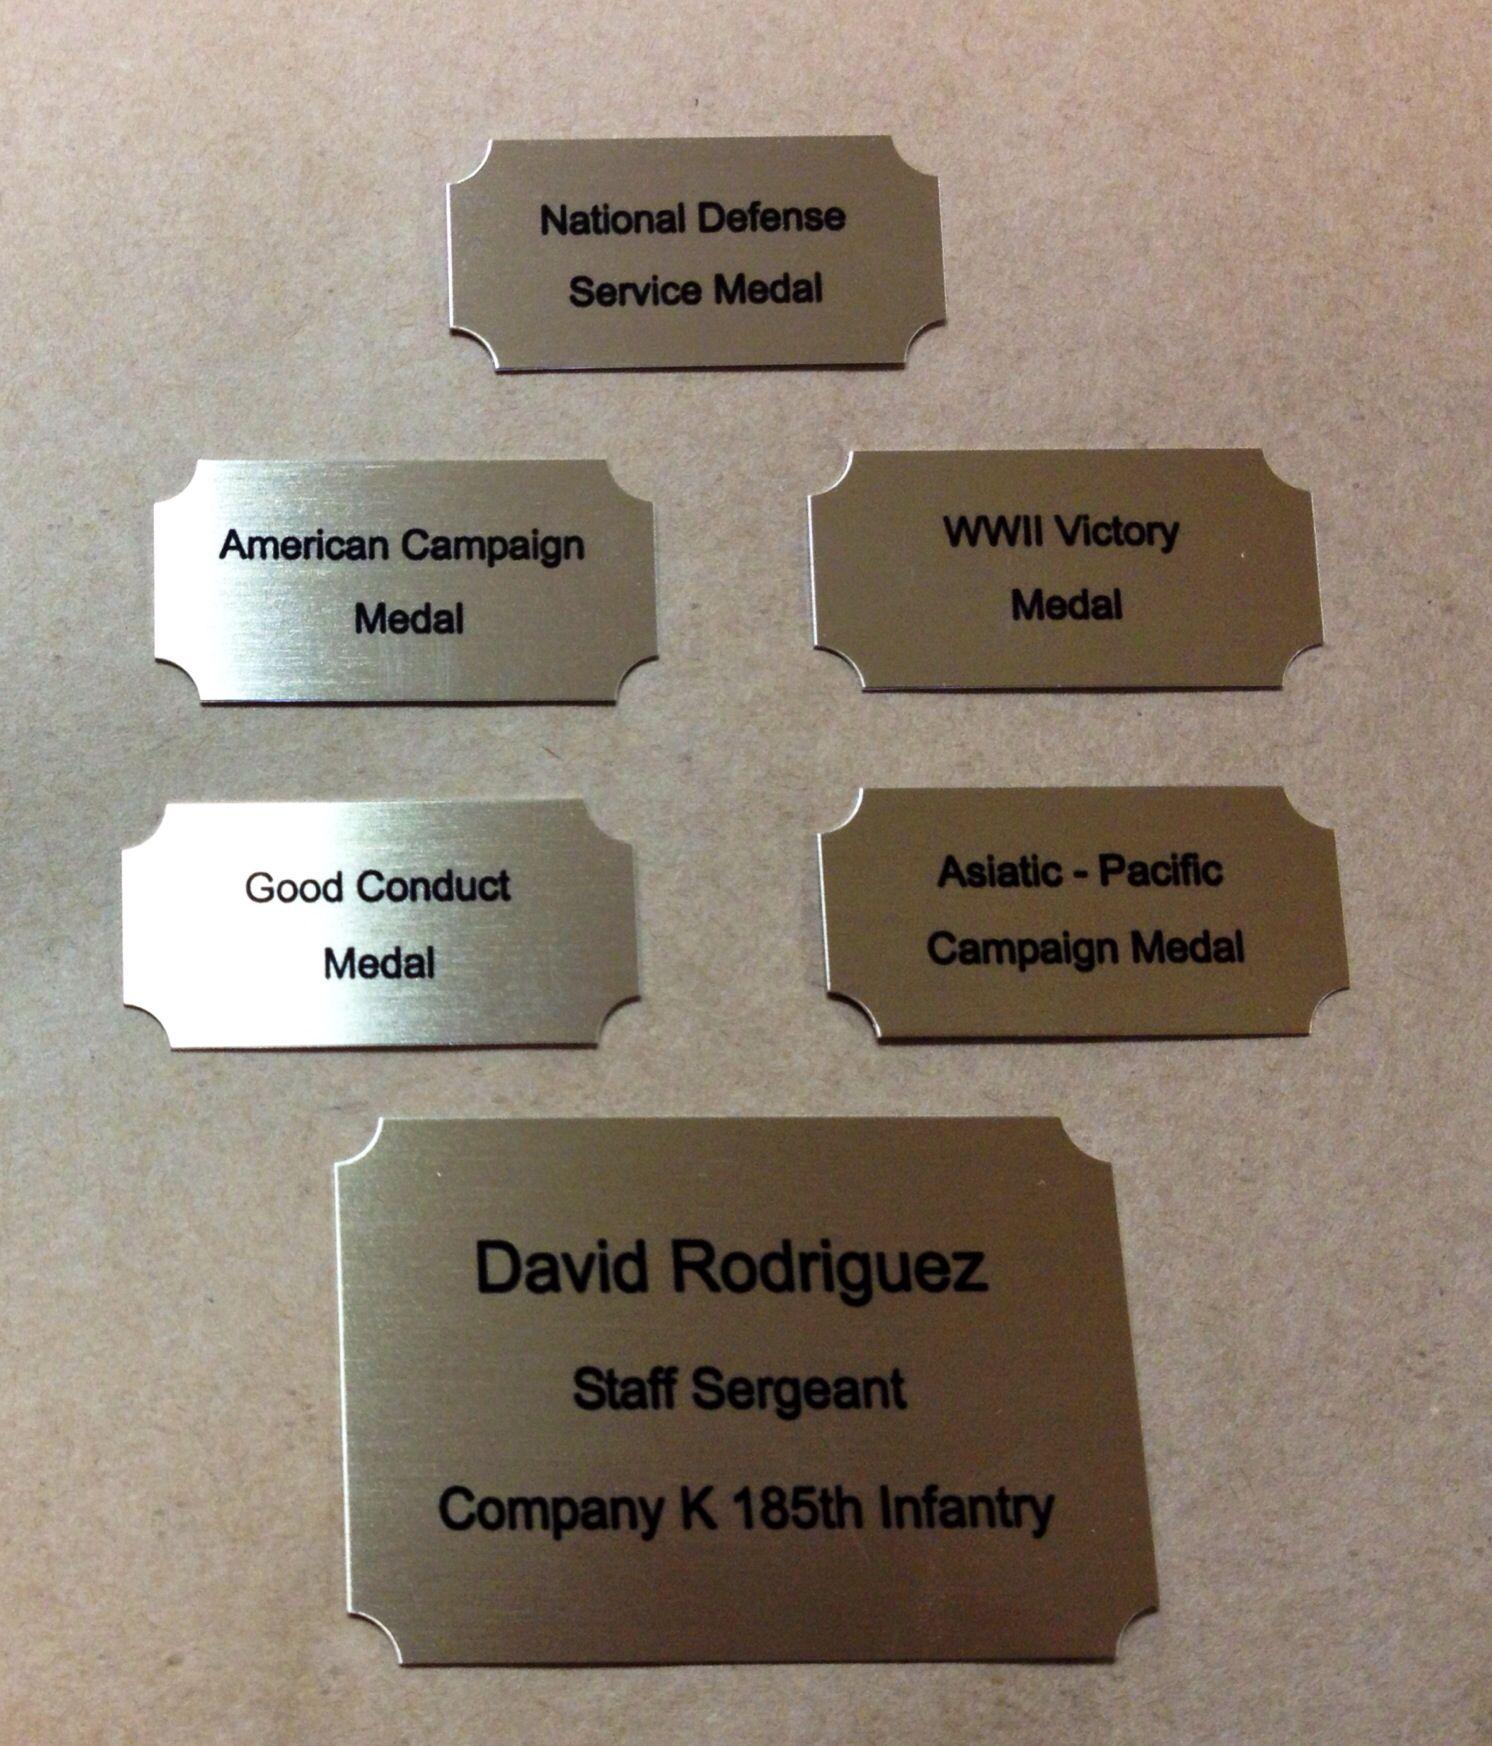 Custom Name Plates For Military Shadow Box Ordered Custom Engraved